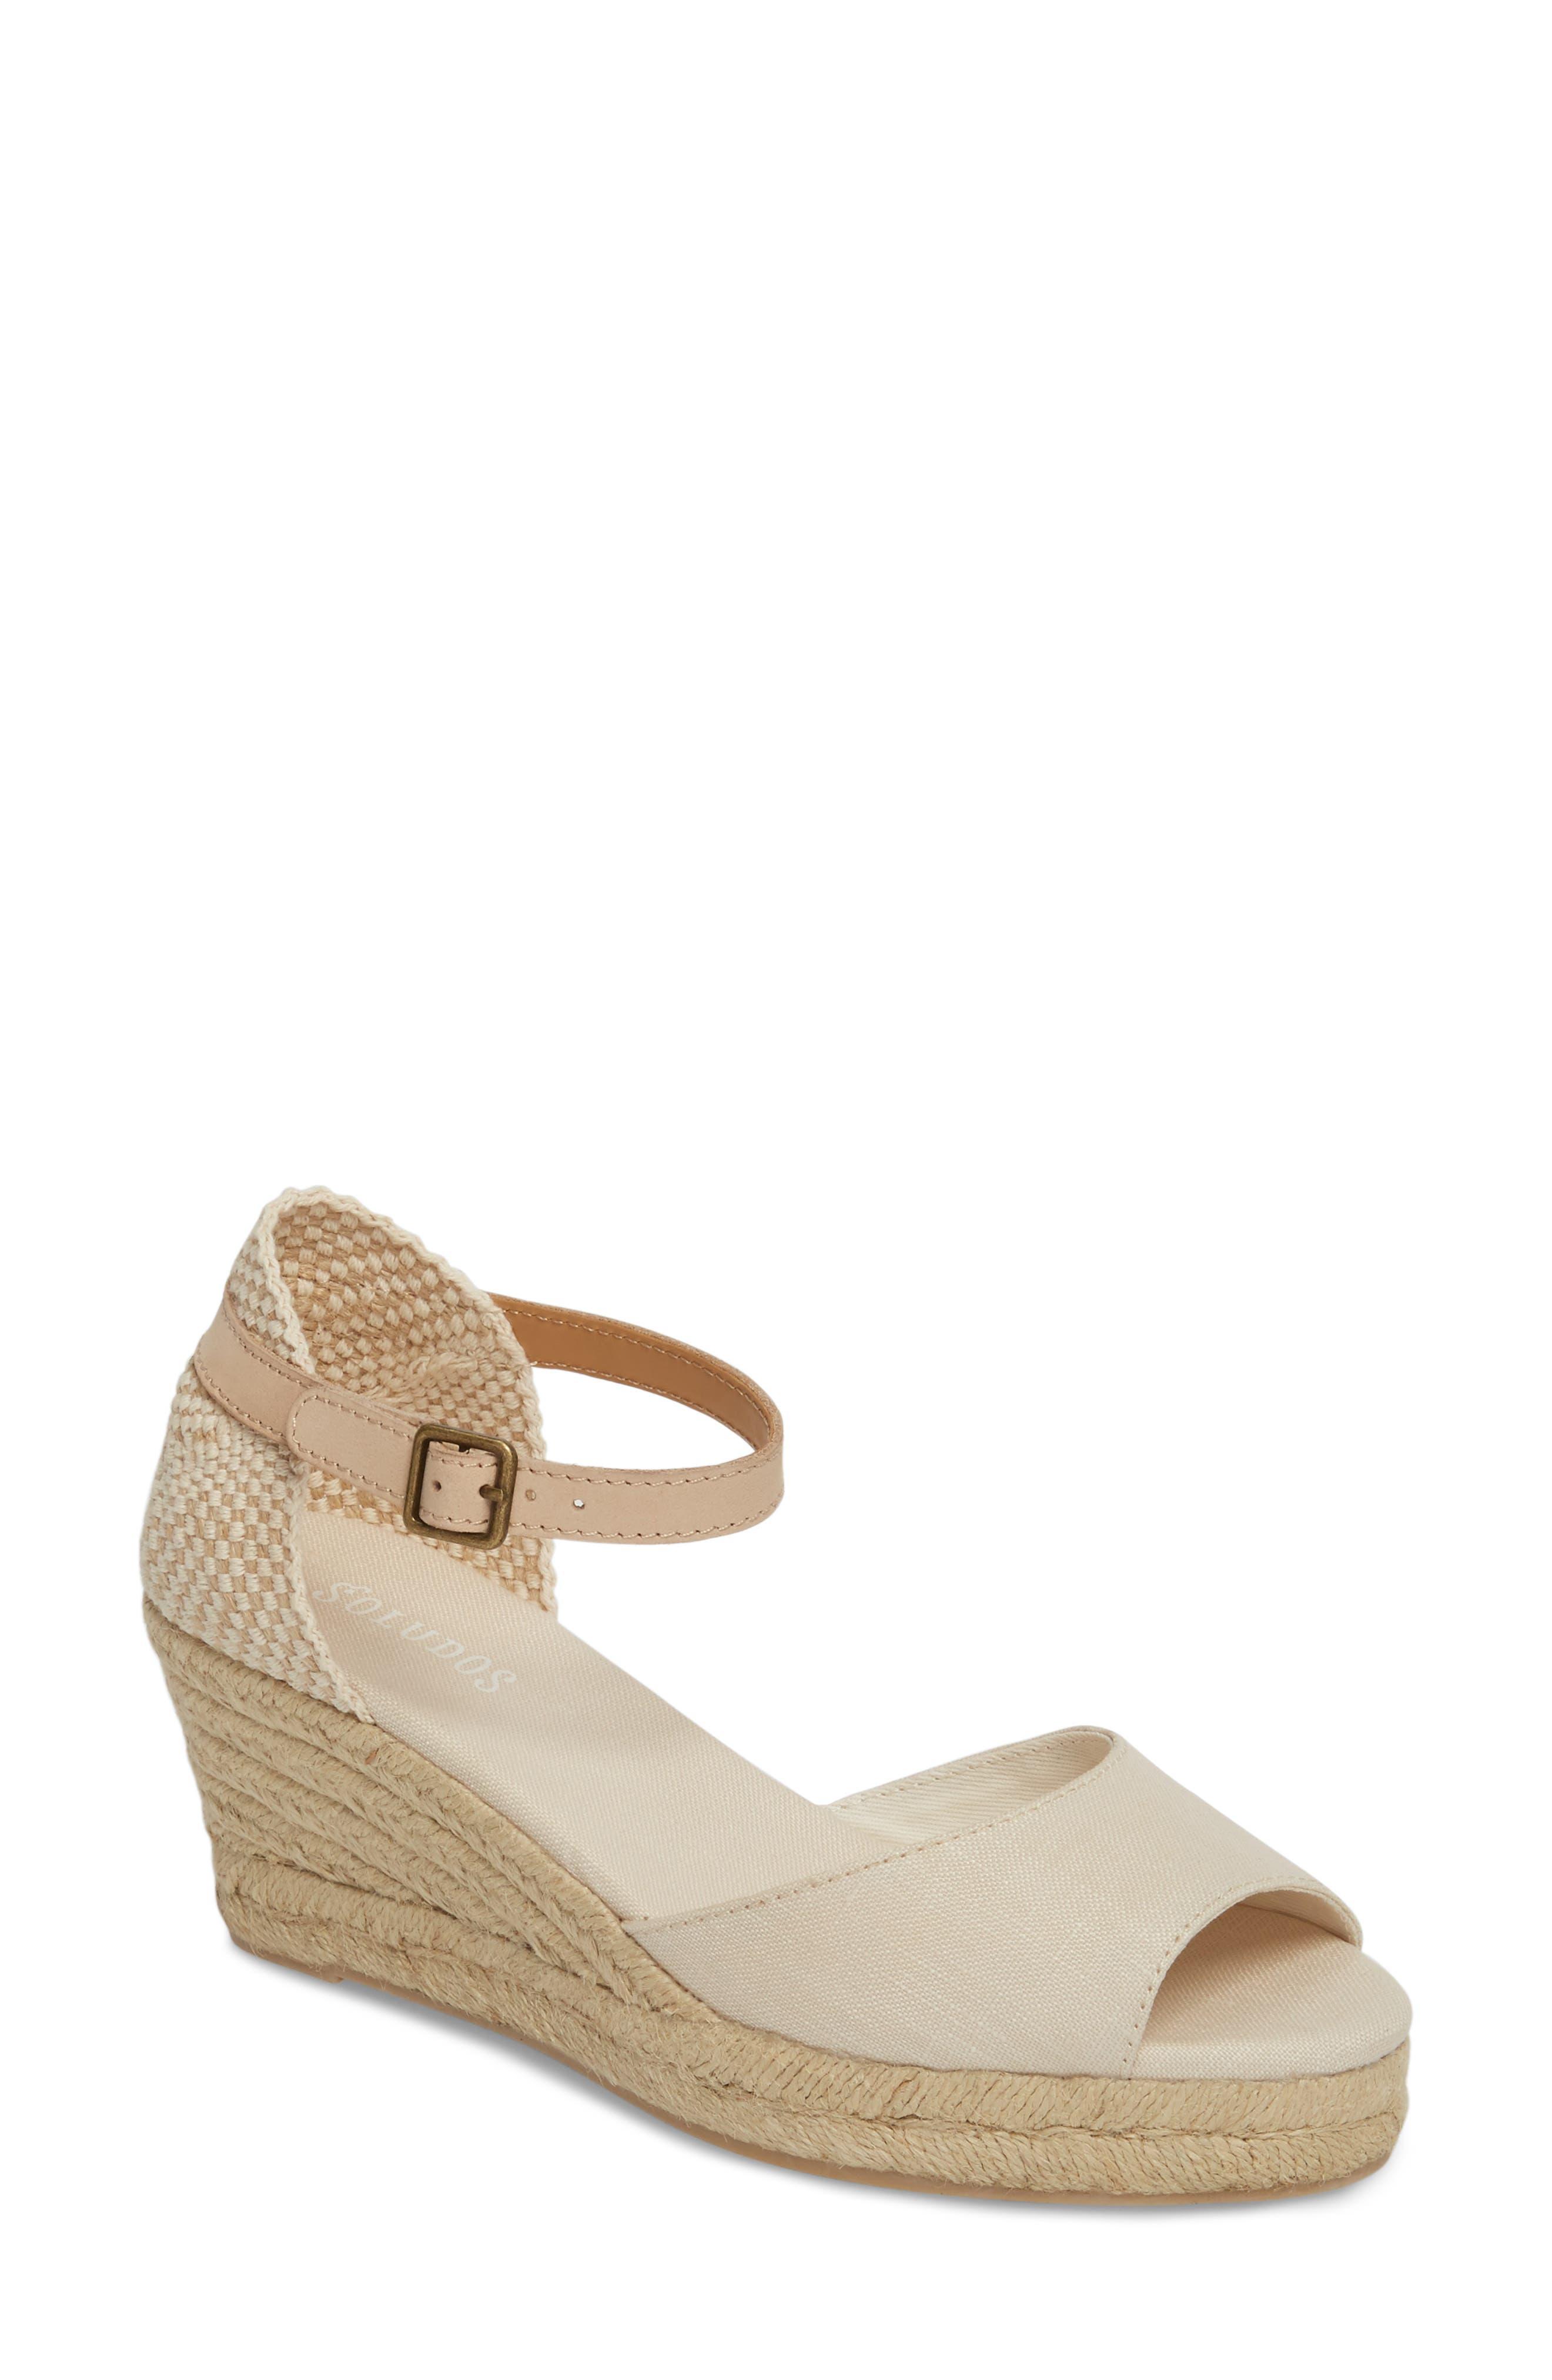 Soludos Espadrille Wedge Sandal, Pink